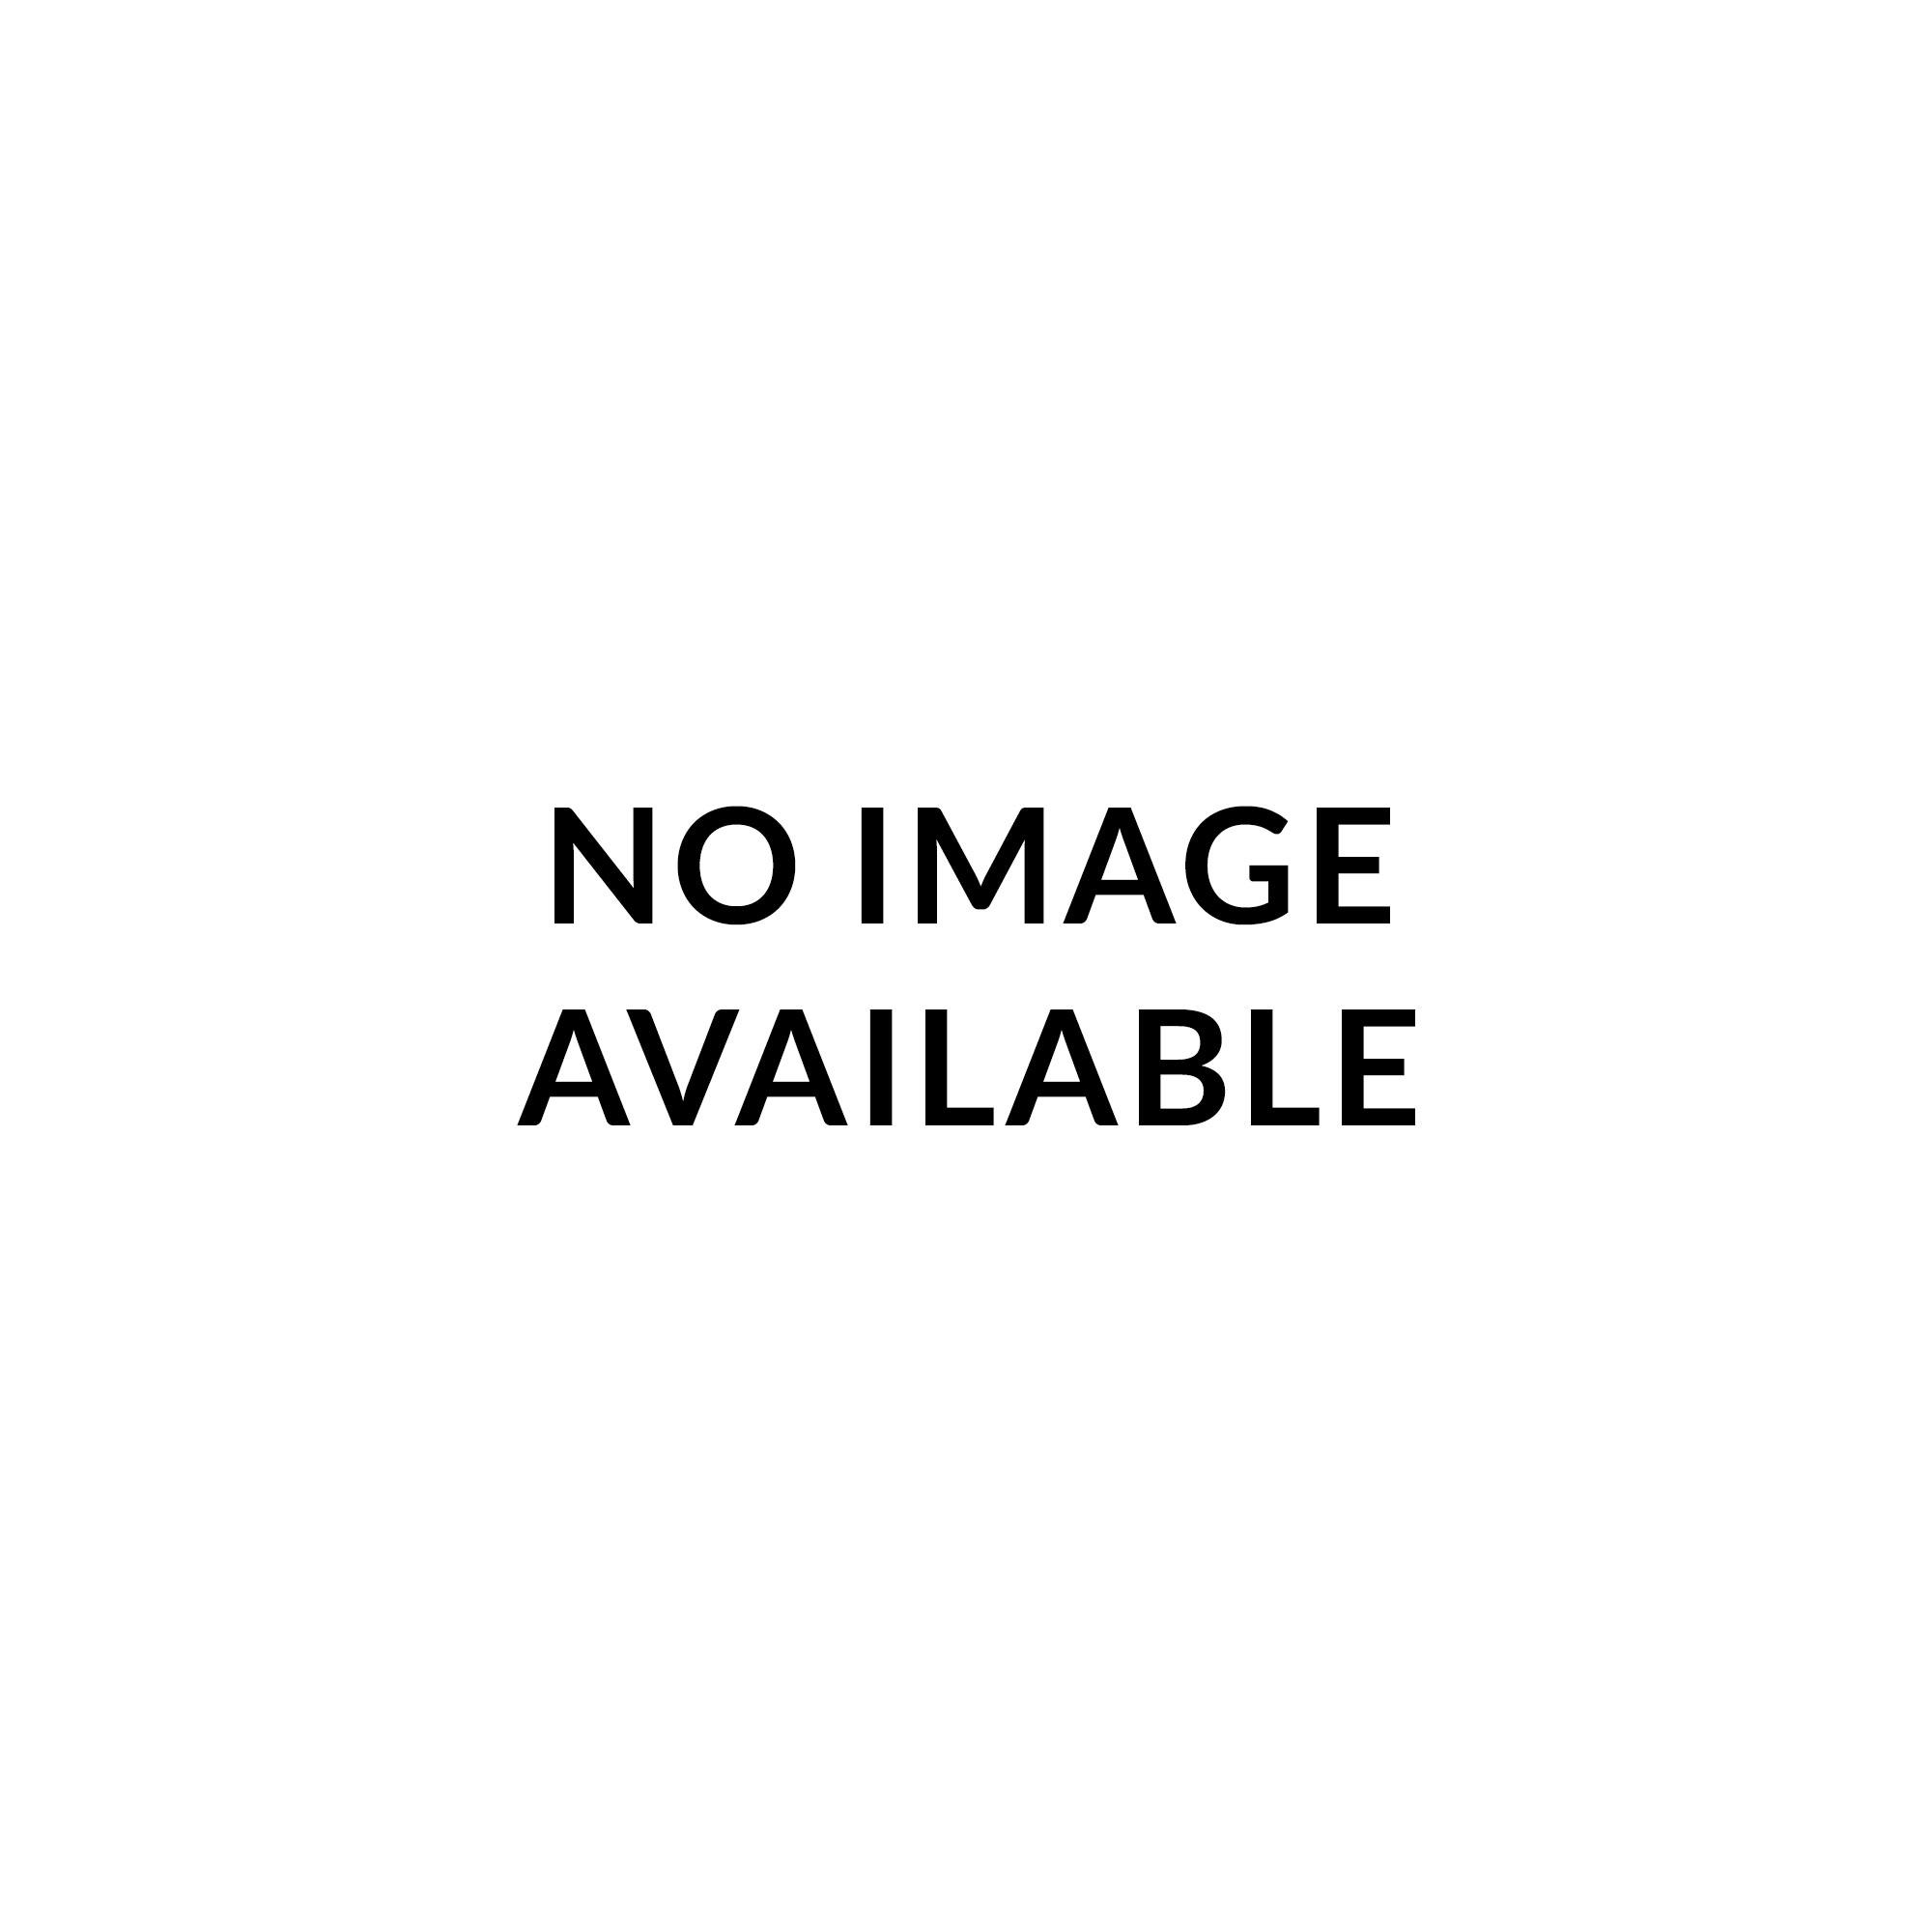 Squier Stratocaster Guitar Tremolo Arm White Tip 004-1359-000